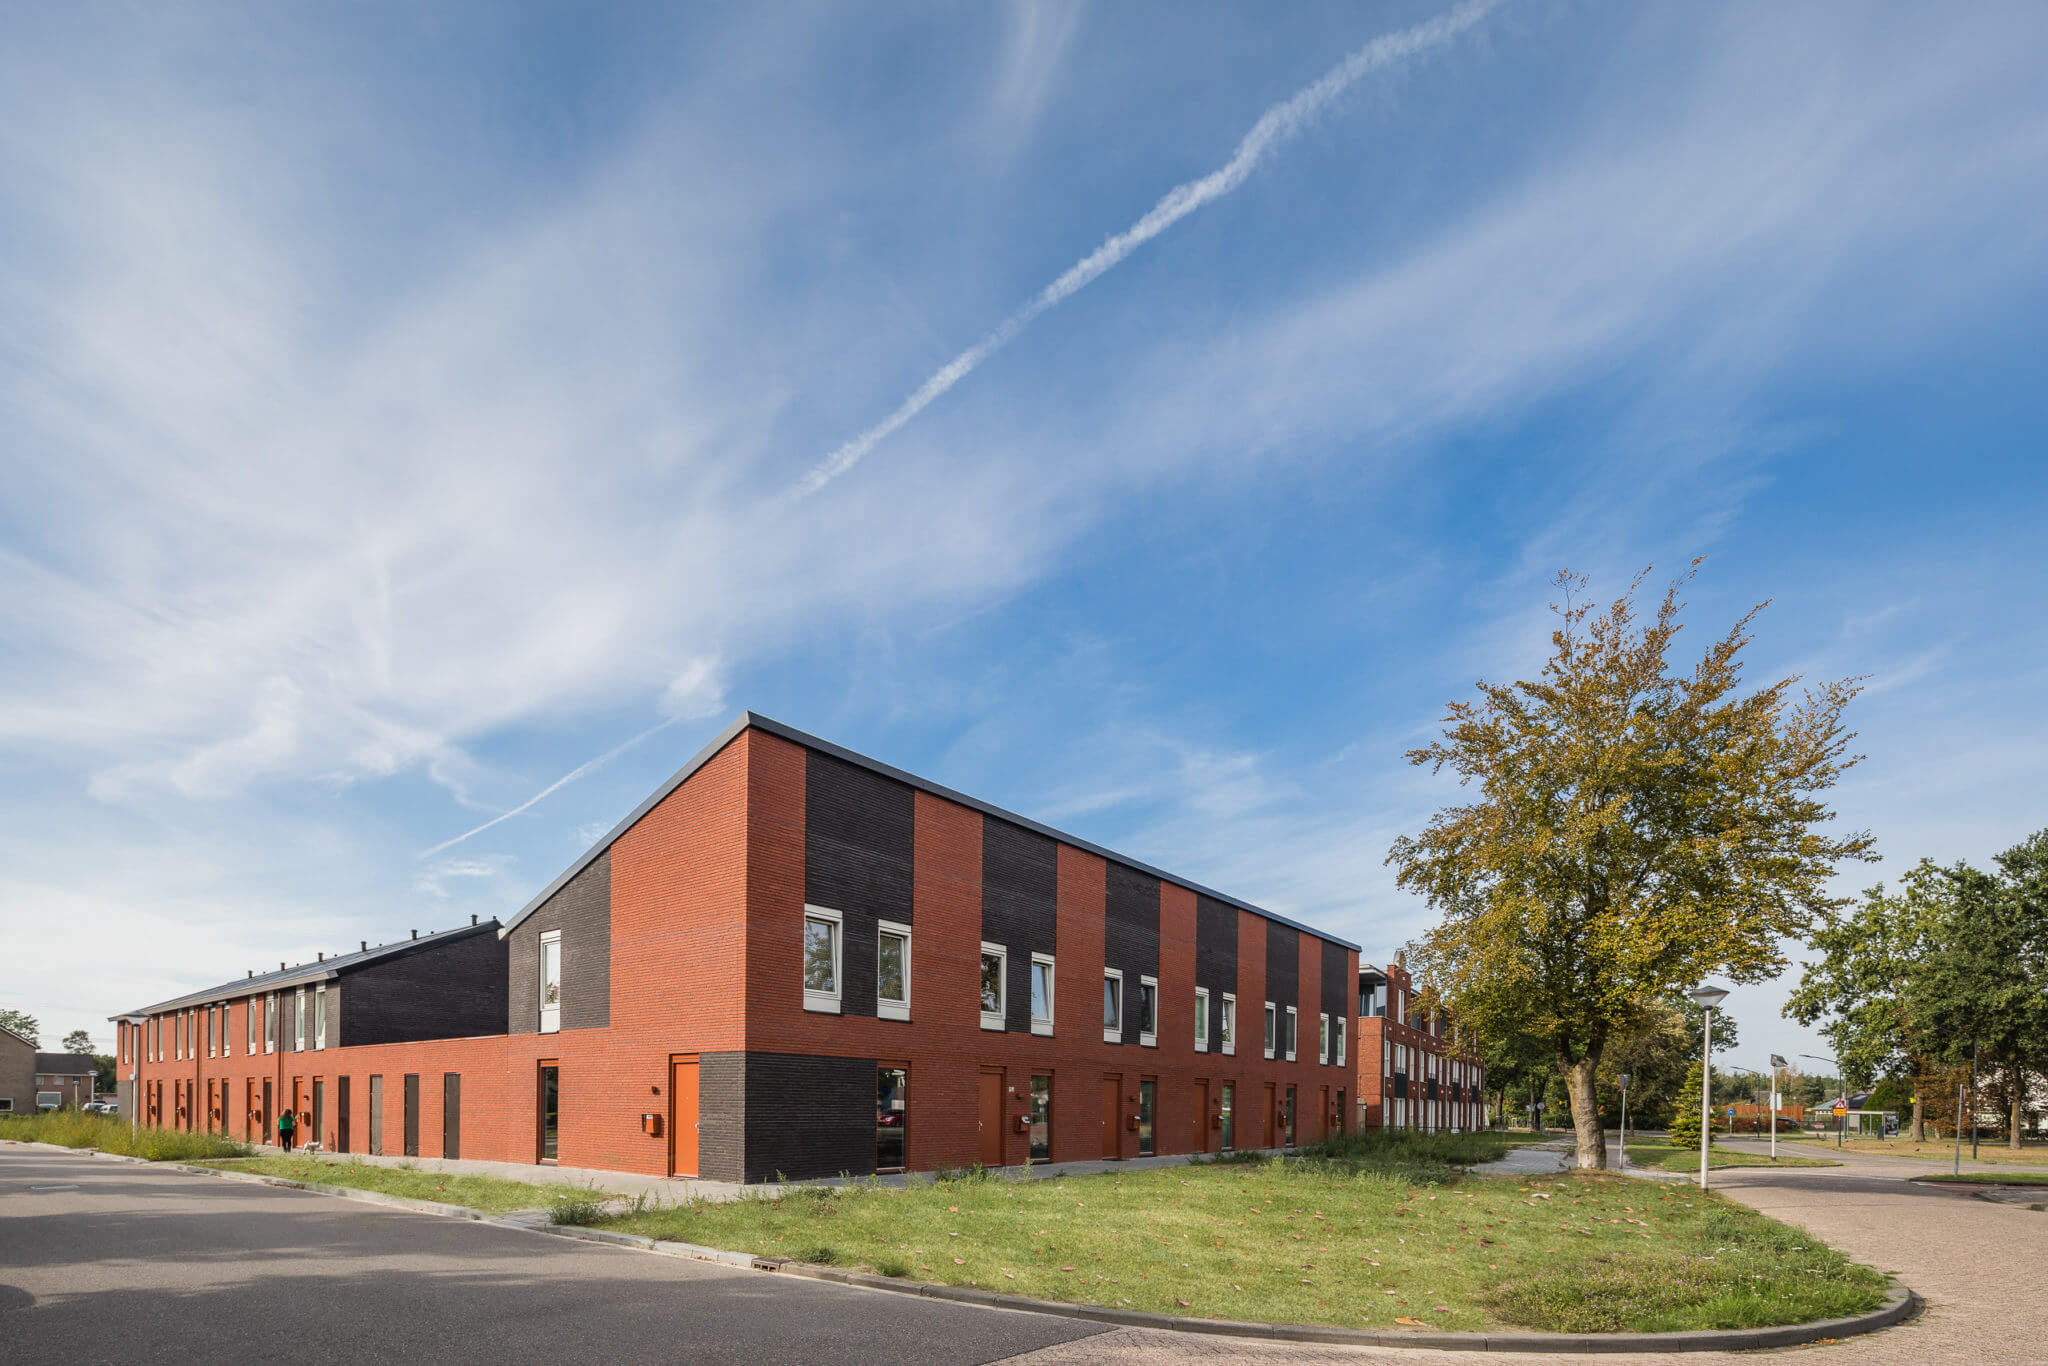 Helmond Mierlo Hout PV panelen zonnepanelen warmtepomp energieneutraal A++++ Brabant pilot